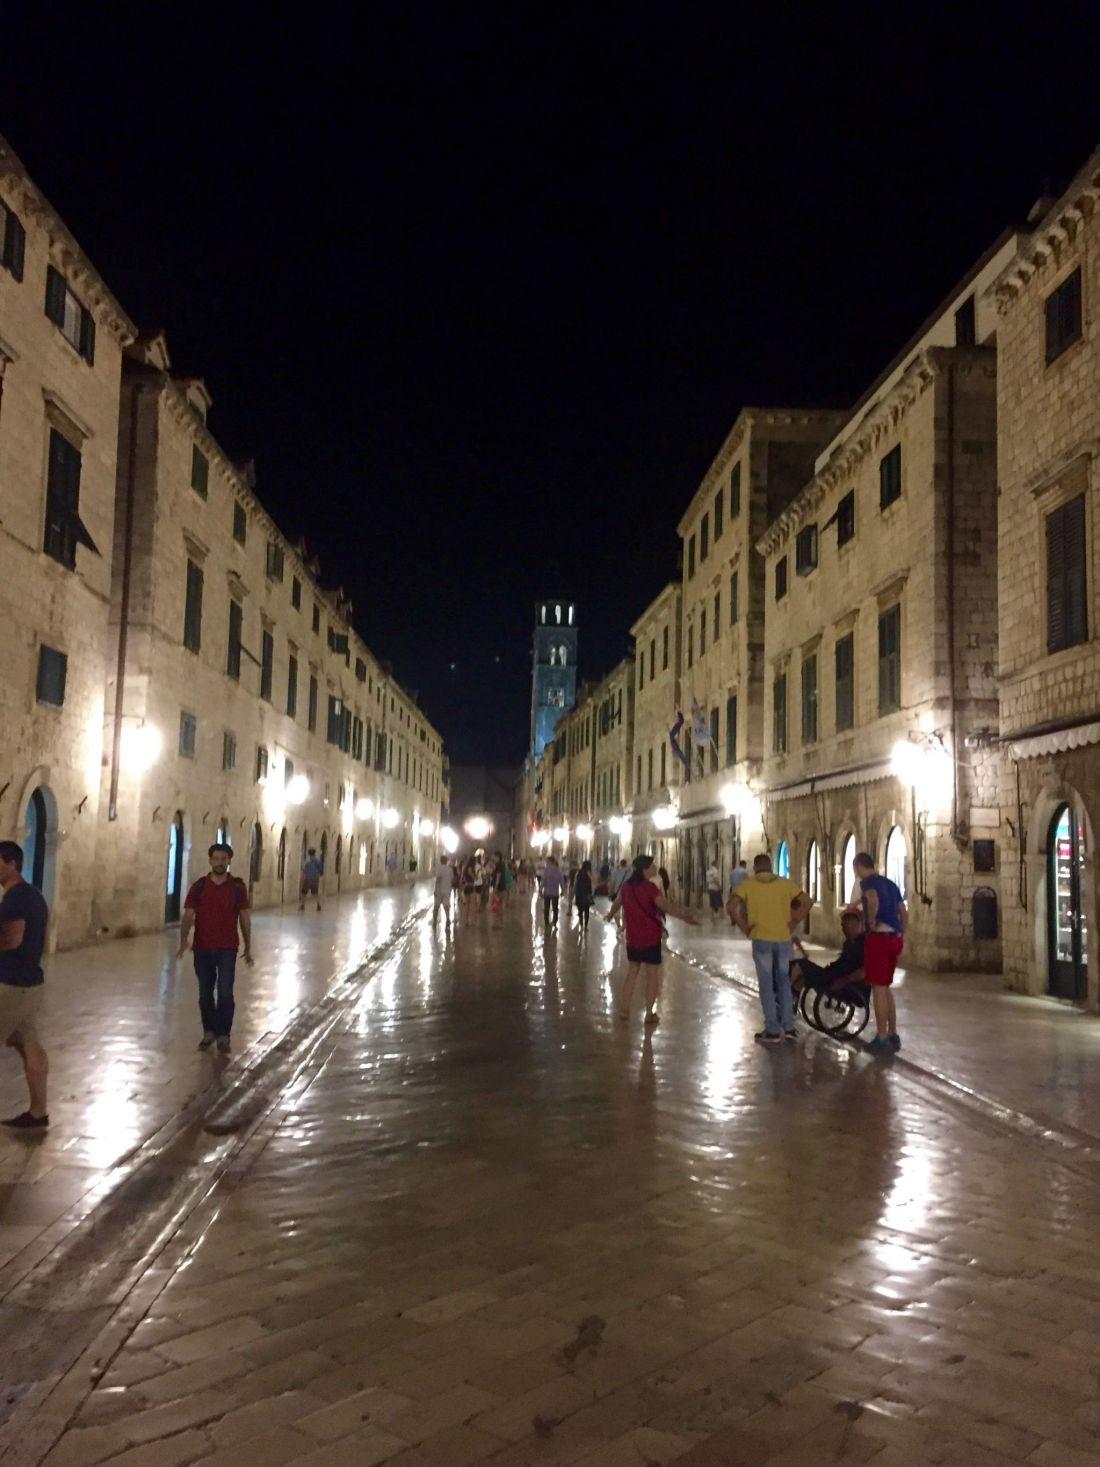 Dubrovnik Old Town plaza